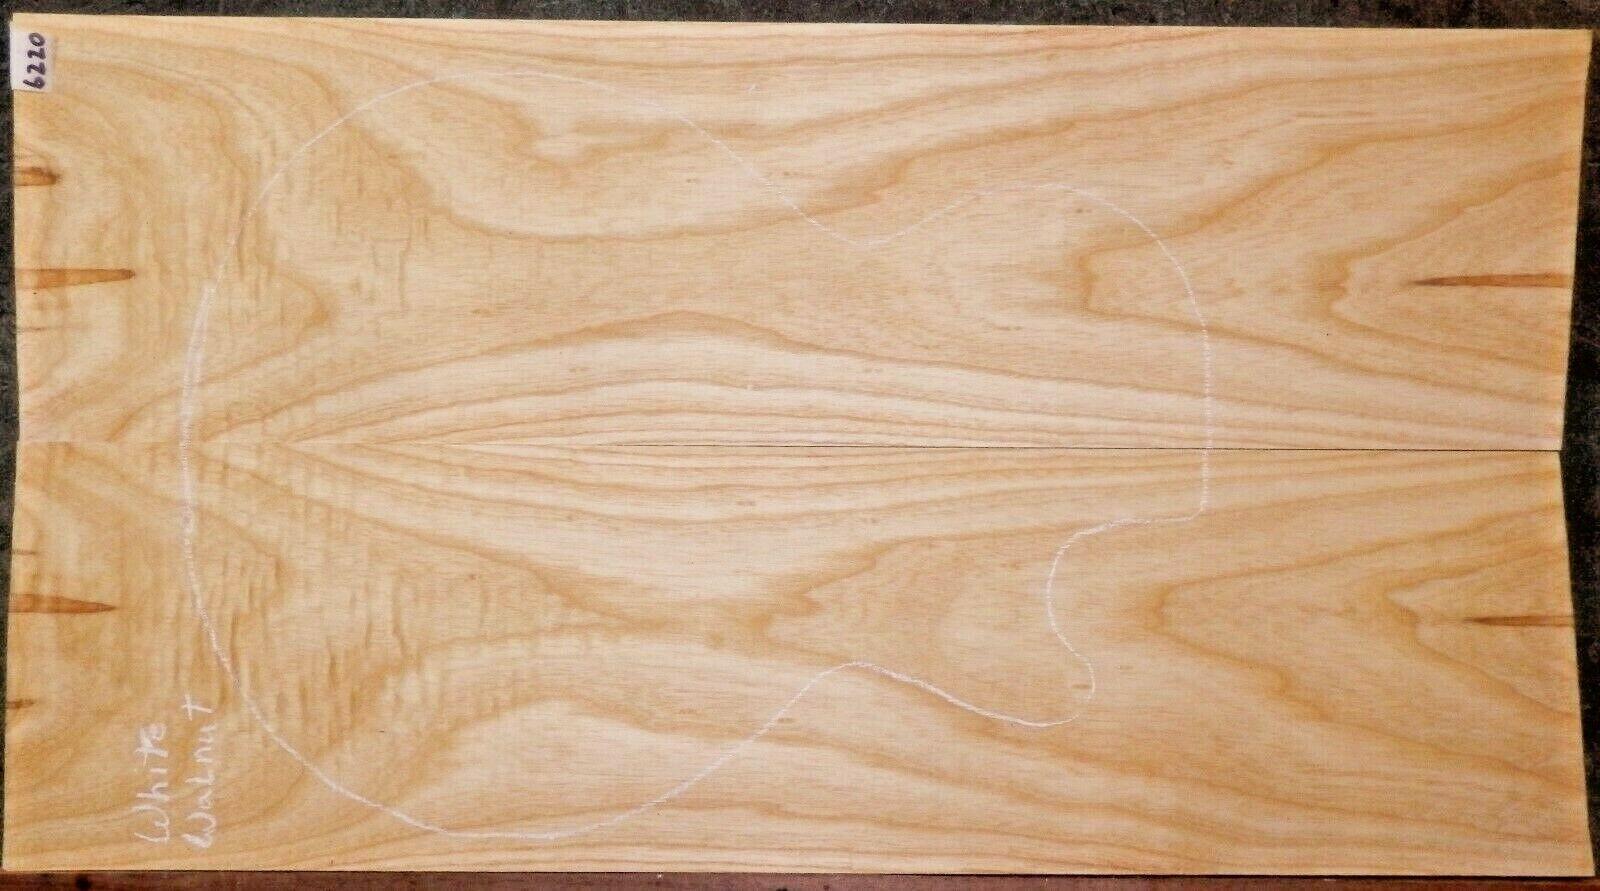 Albino Weiß Walnut Wood 6220 Luthier Solid Body Guitar Top Set 27x15-x.375